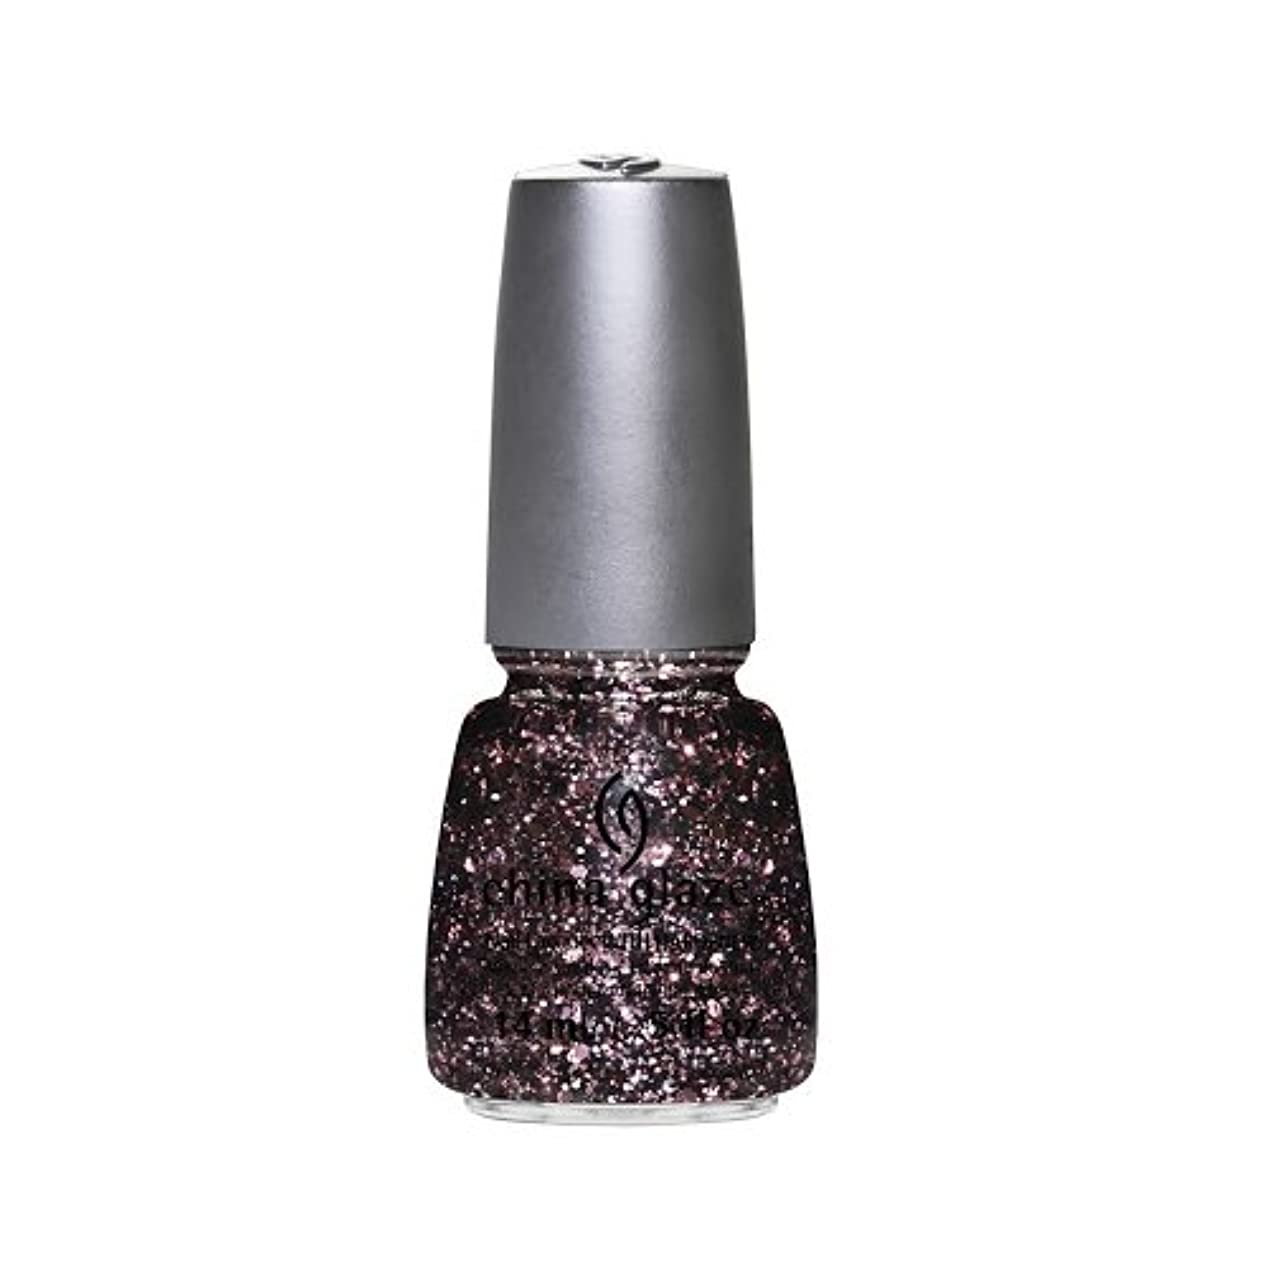 (3 Pack) CHINA GLAZE Nail Lacquer - Glitz Bitz ?n Pieces Collection - Razzle Me Dazzle Me (並行輸入品)